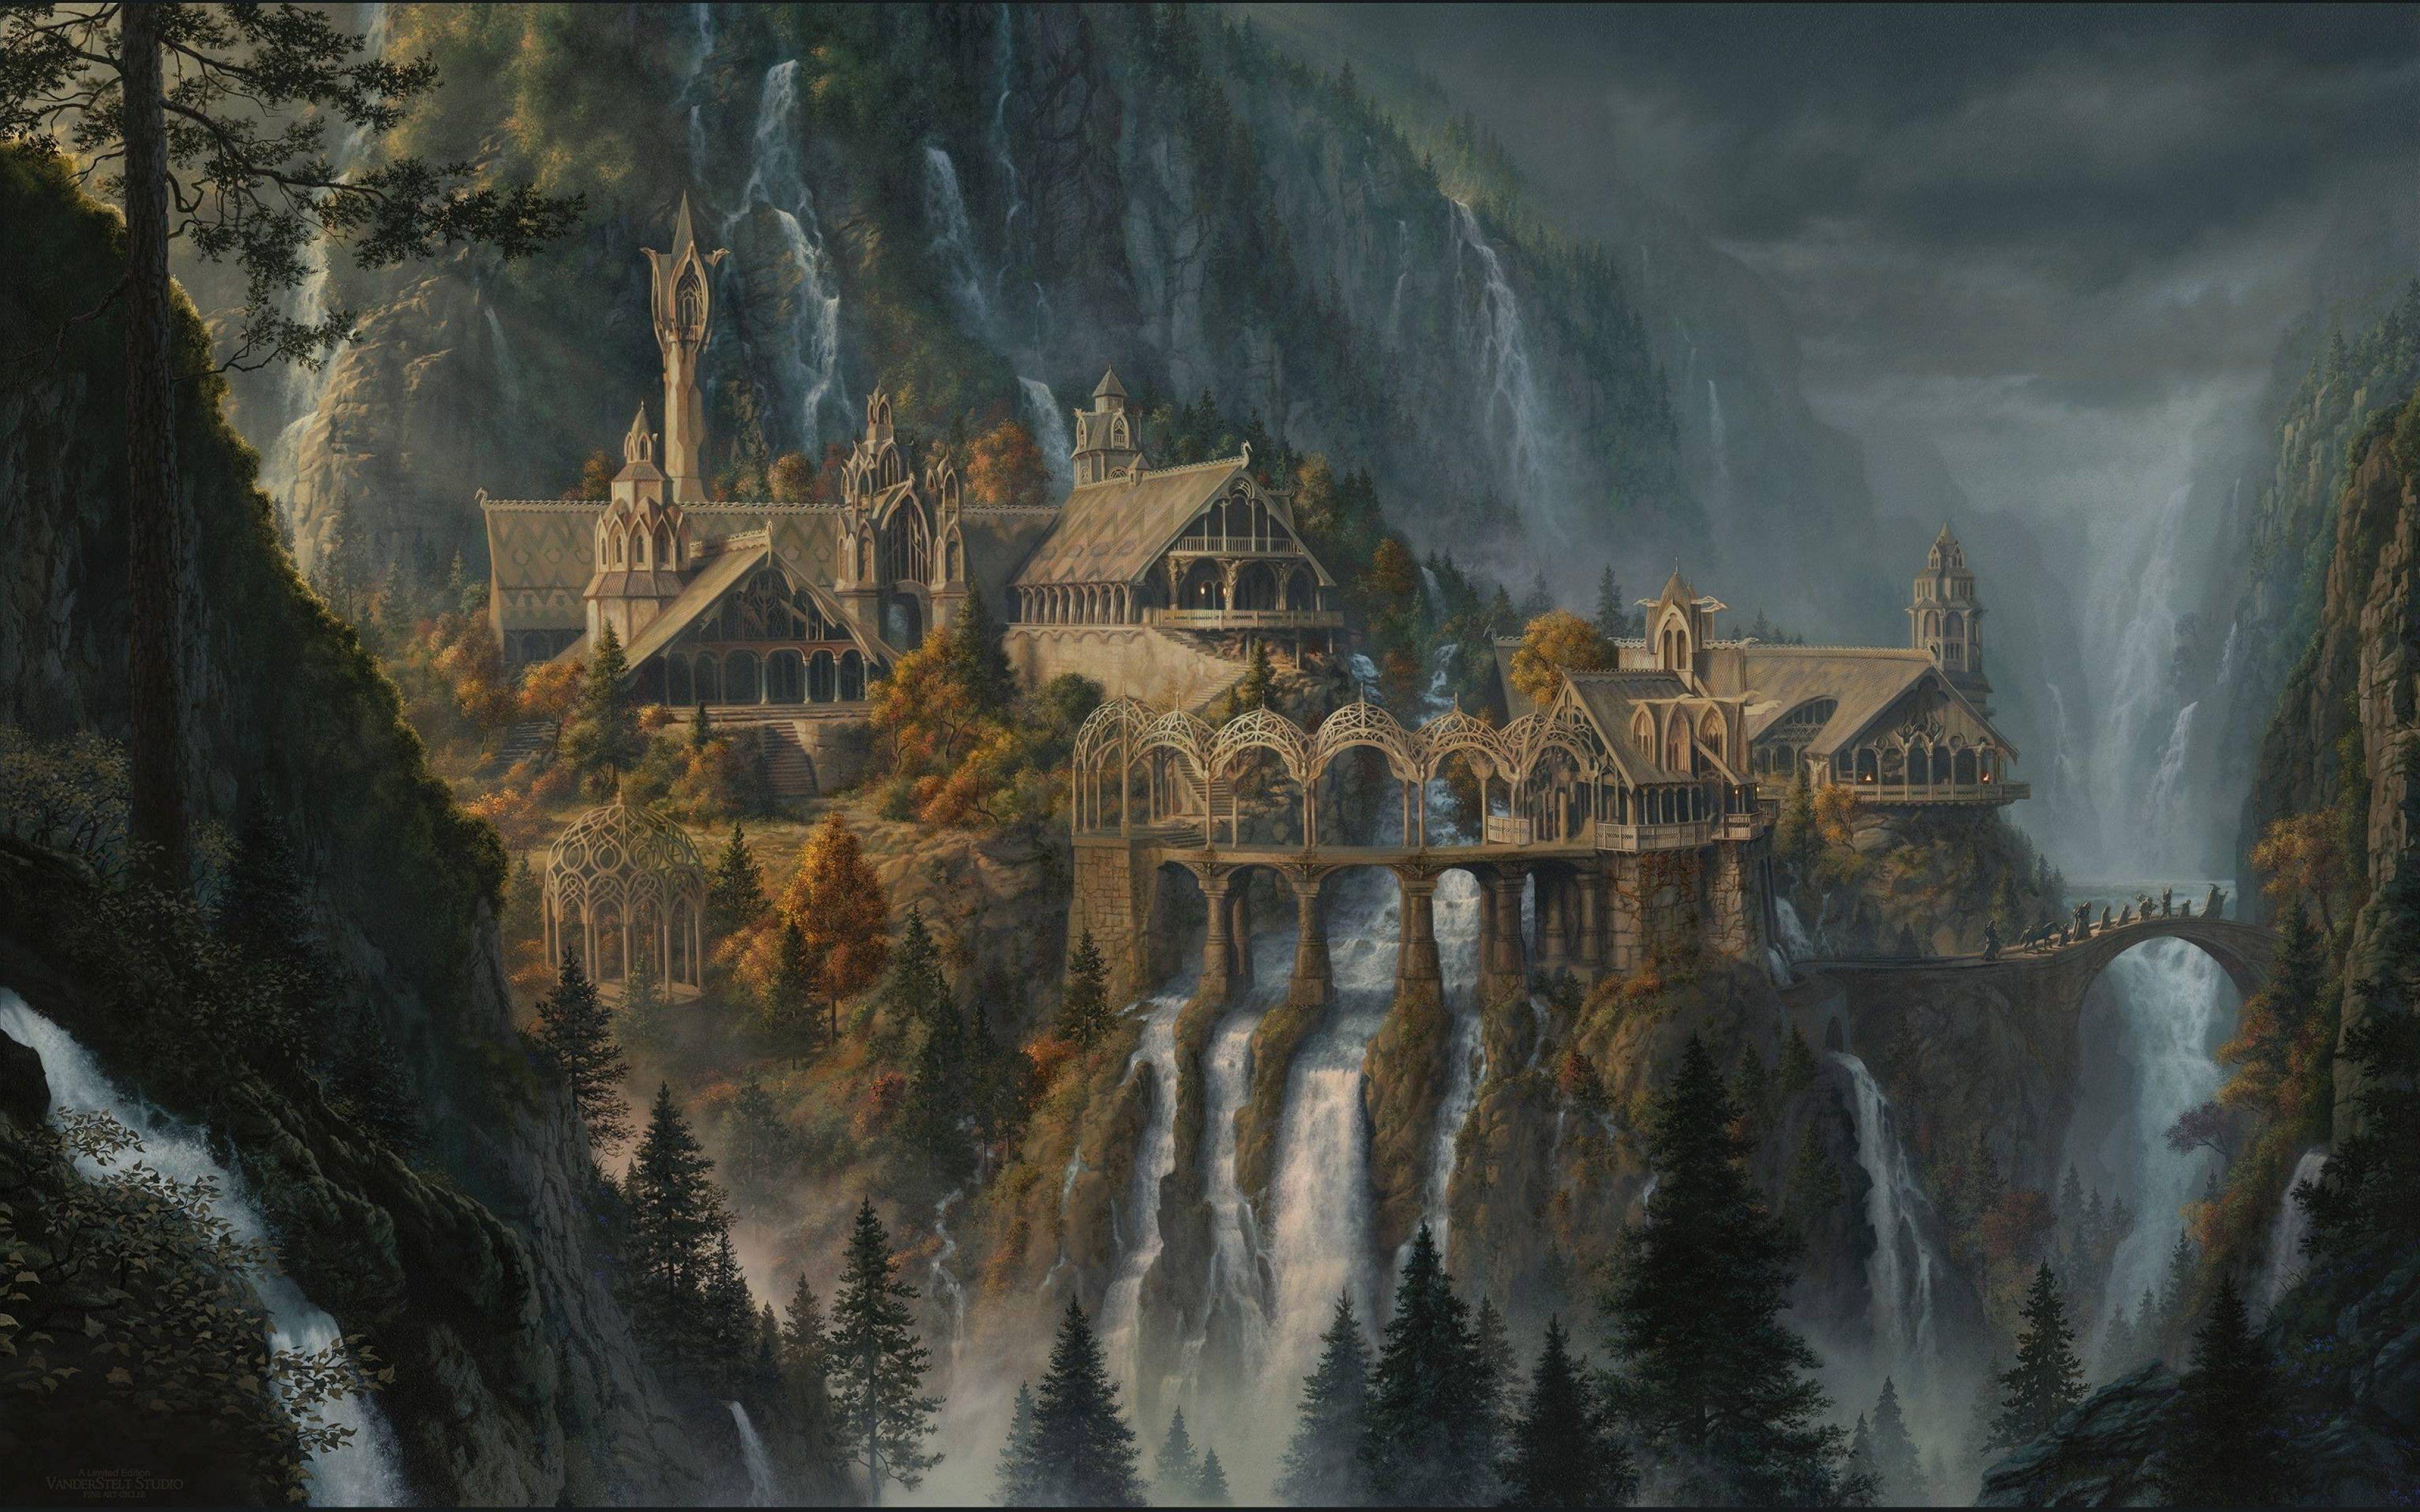 Art Artwork Cities Detail Lord Lotr Rings River Waterfall 4k Wallpaper Hdwallpaper Desktop In 2020 Castle Illustration Fantasy Art Hd Wallpaper